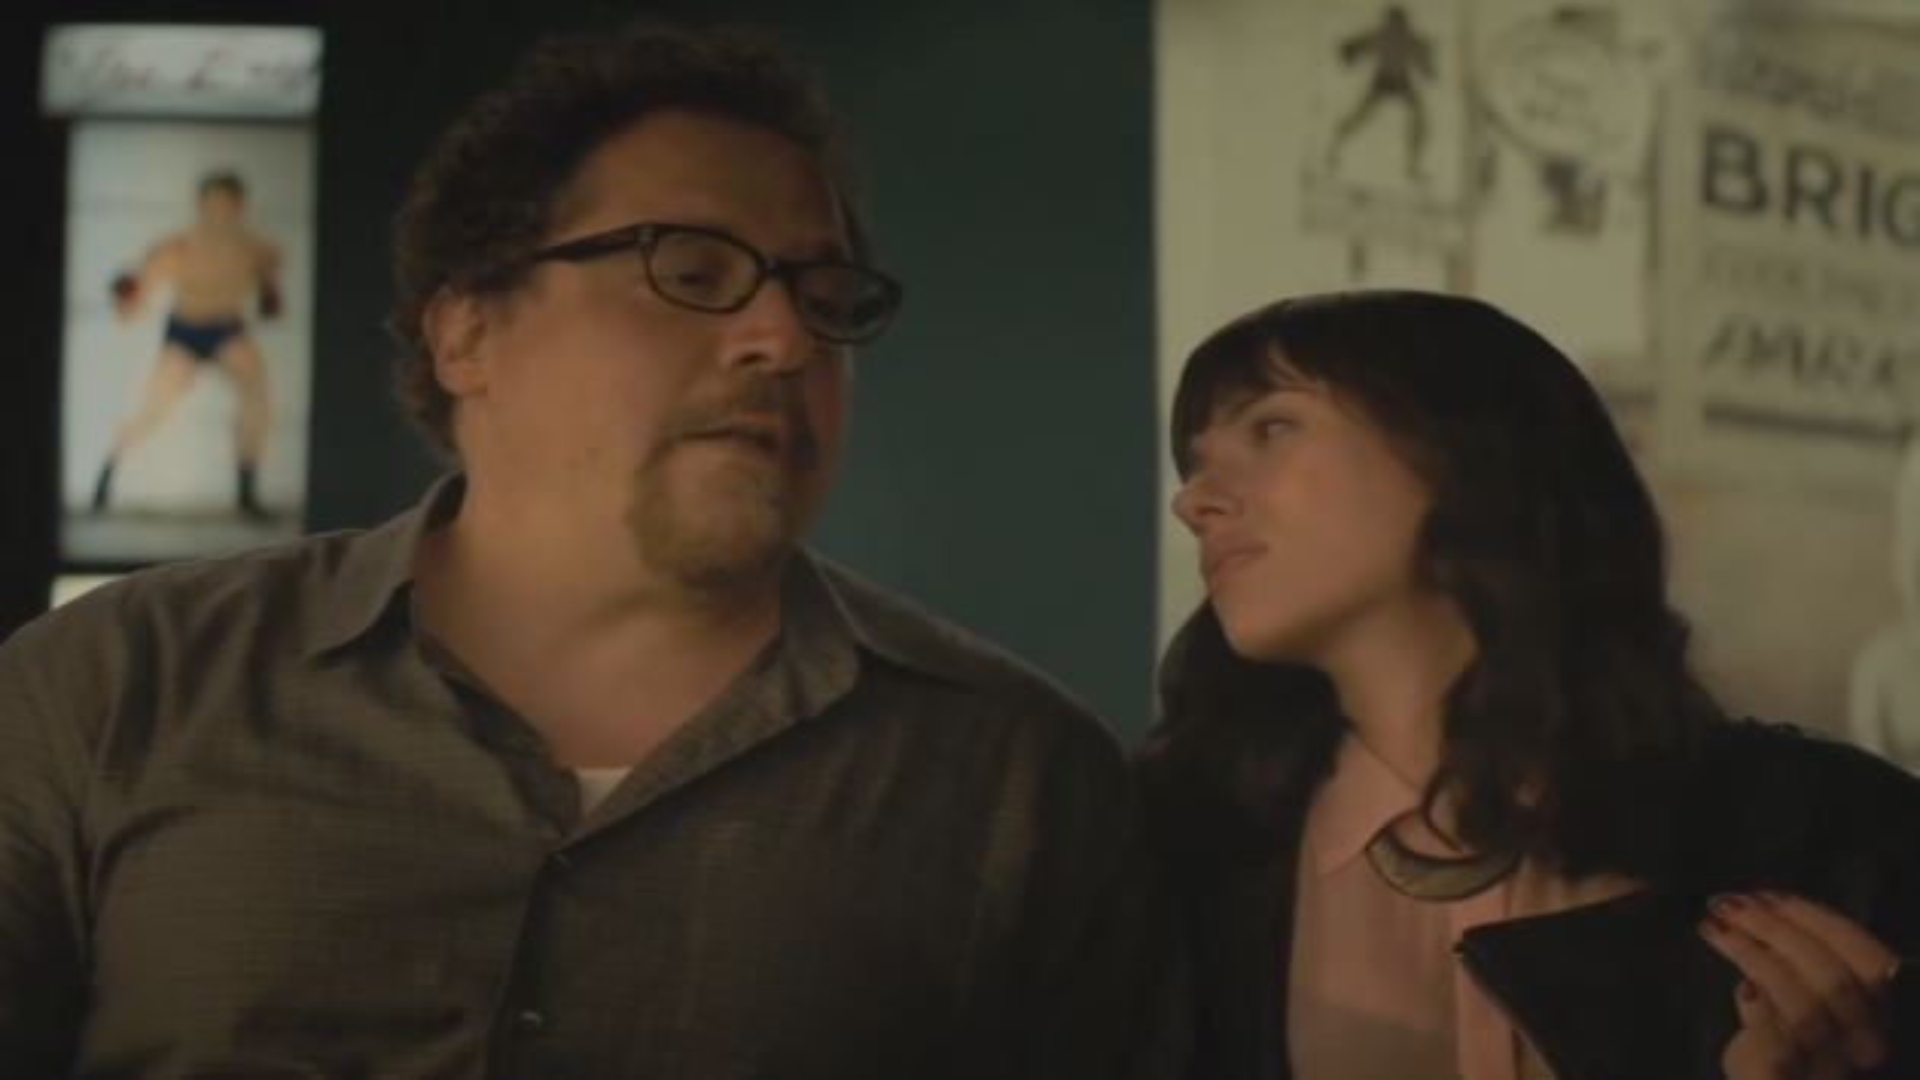 Scarlett-Johansson-Jon-Favreau-Chef-Trailer